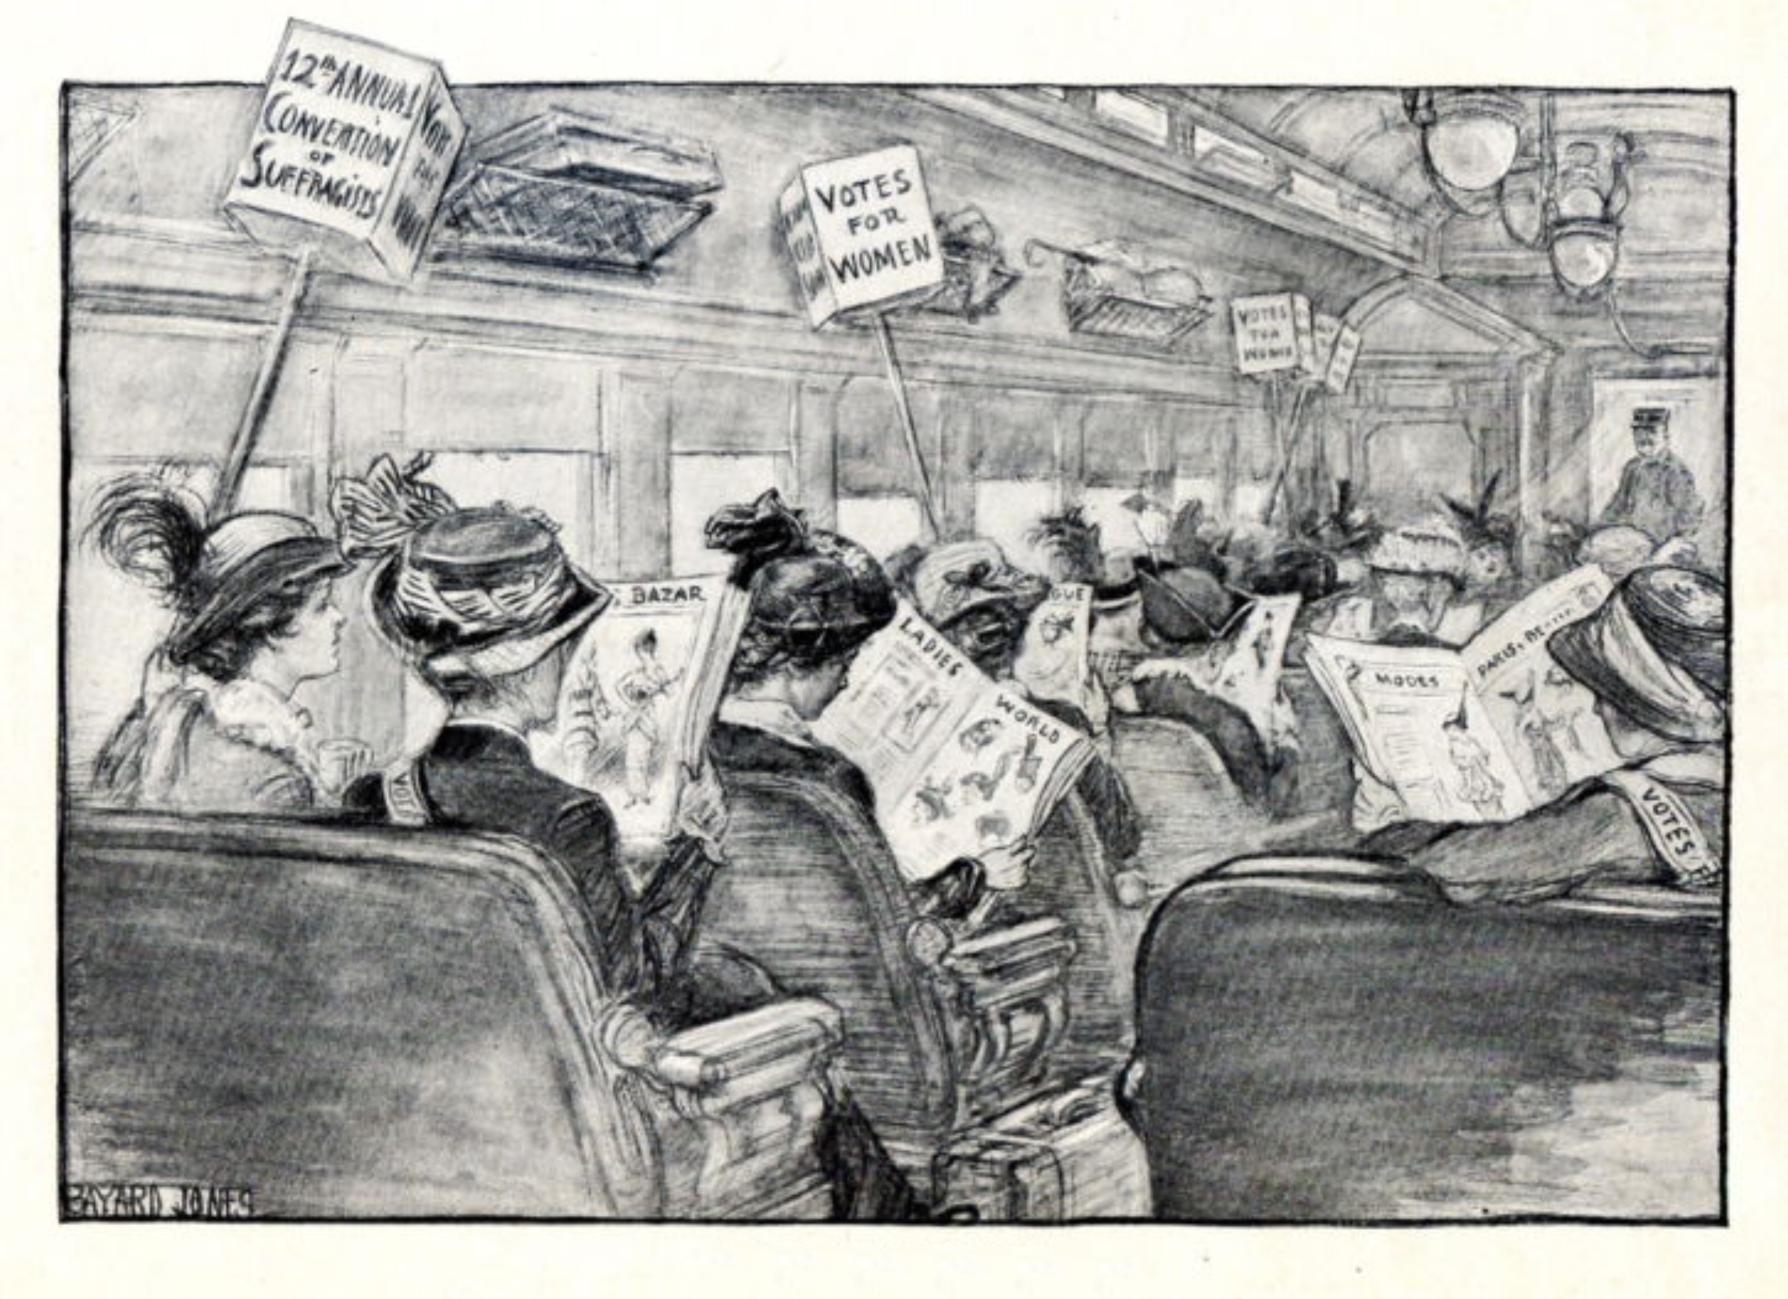 Women's Rights Before 19th Amendment